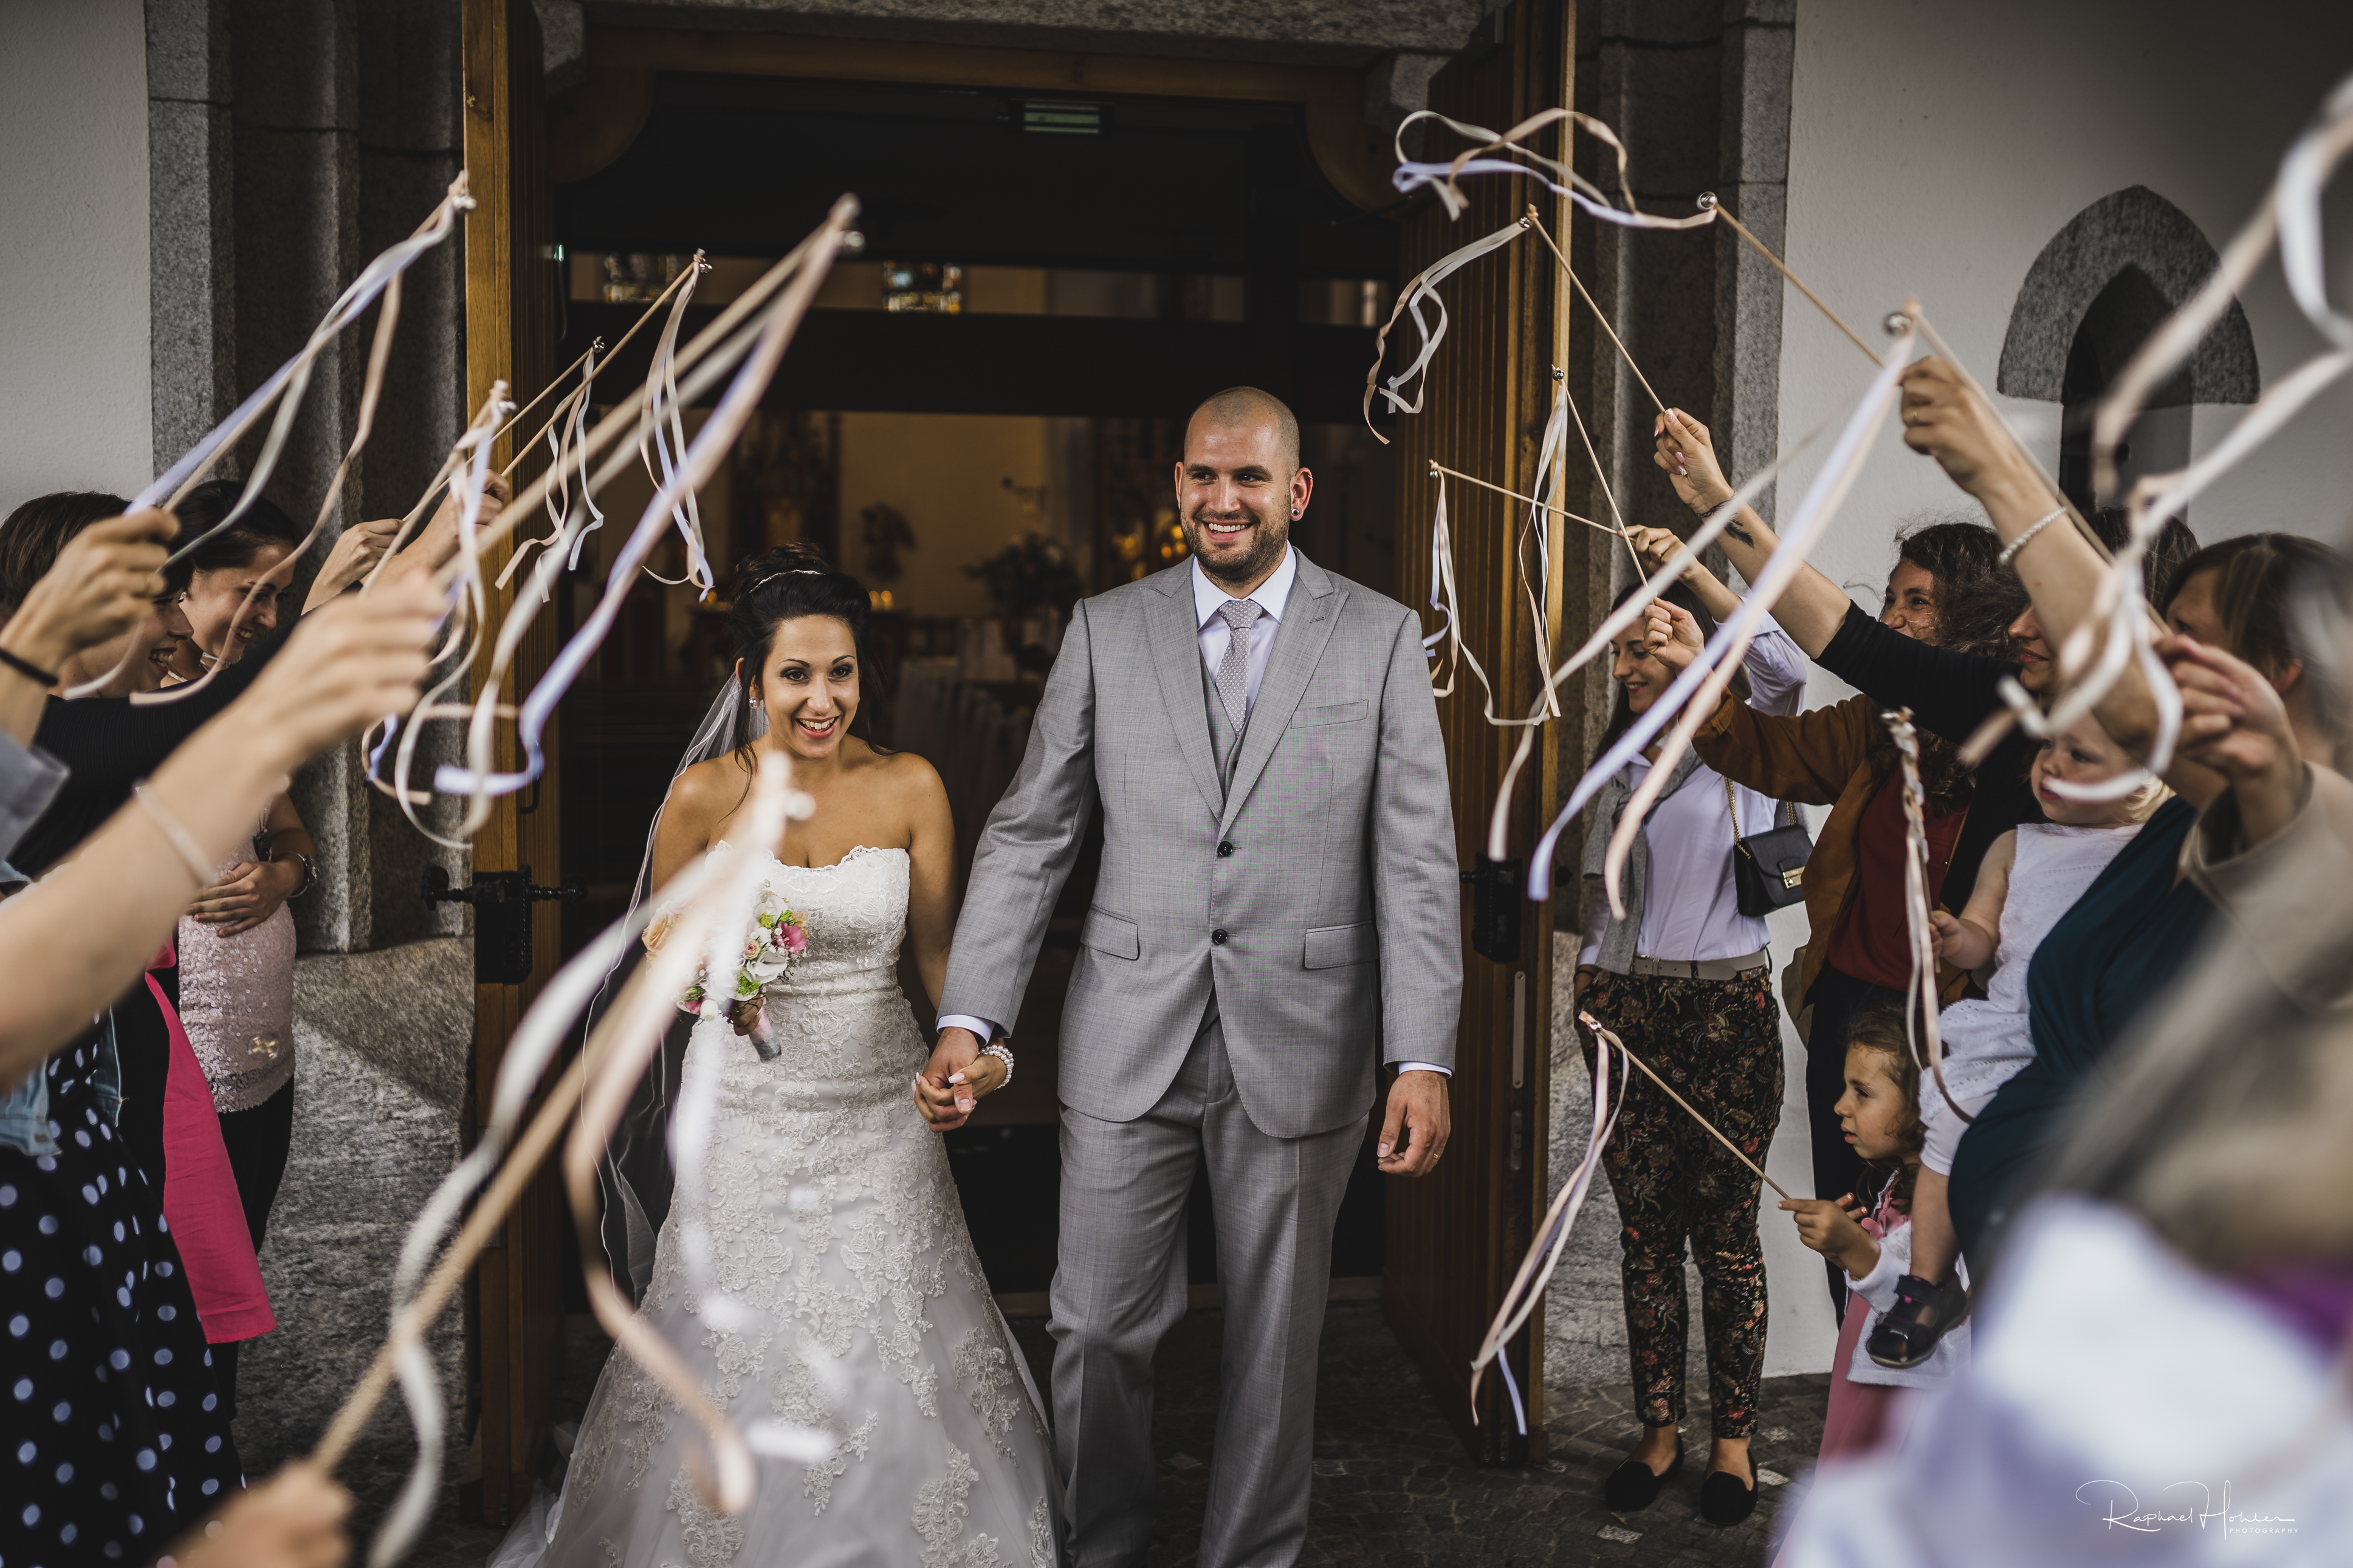 Wedding Kaiseraugst